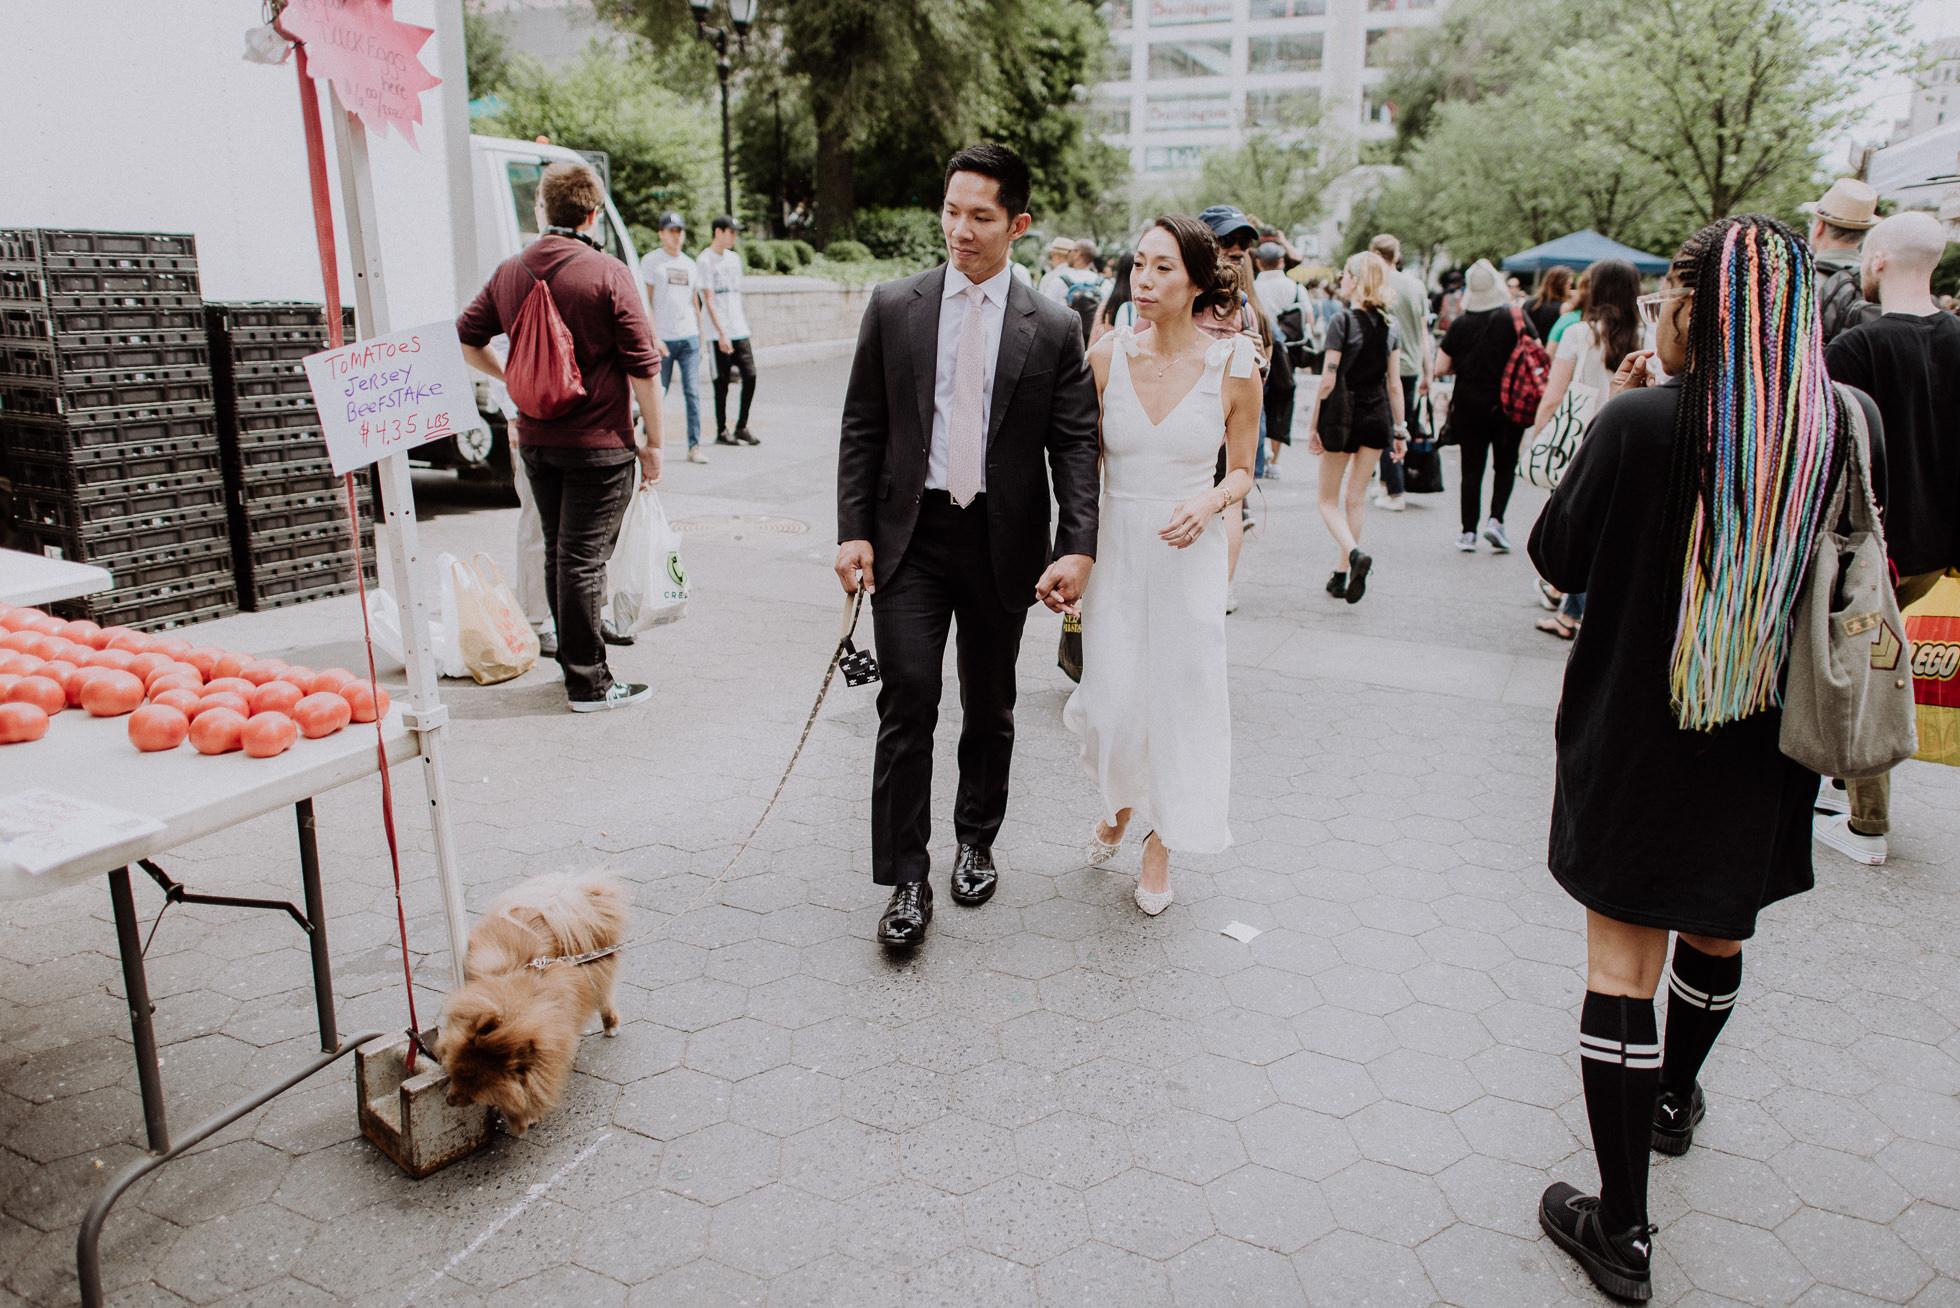 Union Square Greenmarket wedding photos